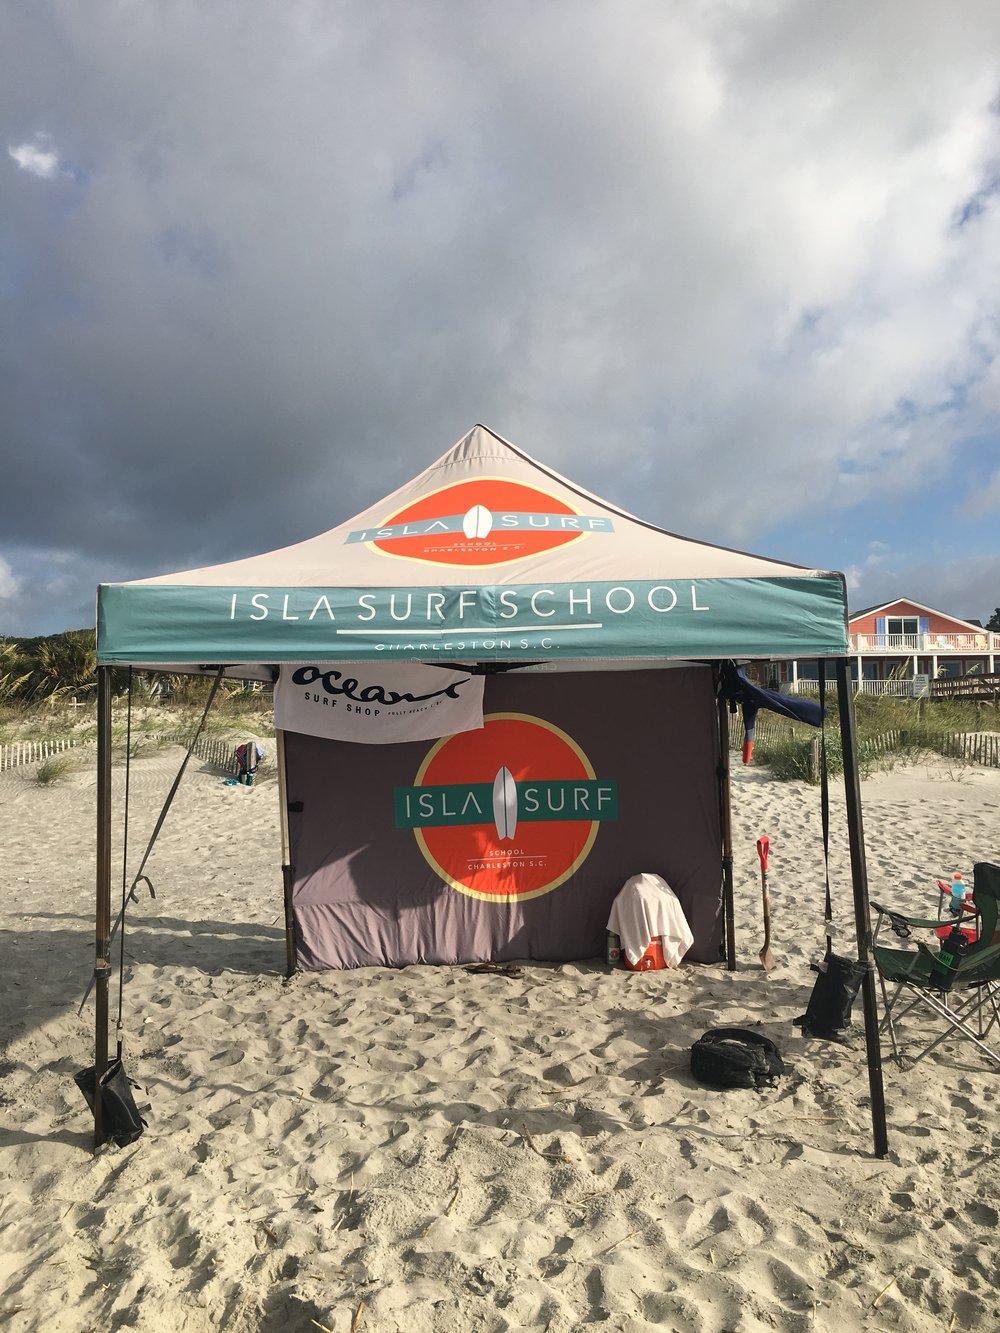 Isla Surf School + Ocean Surf Shop = Good Friends